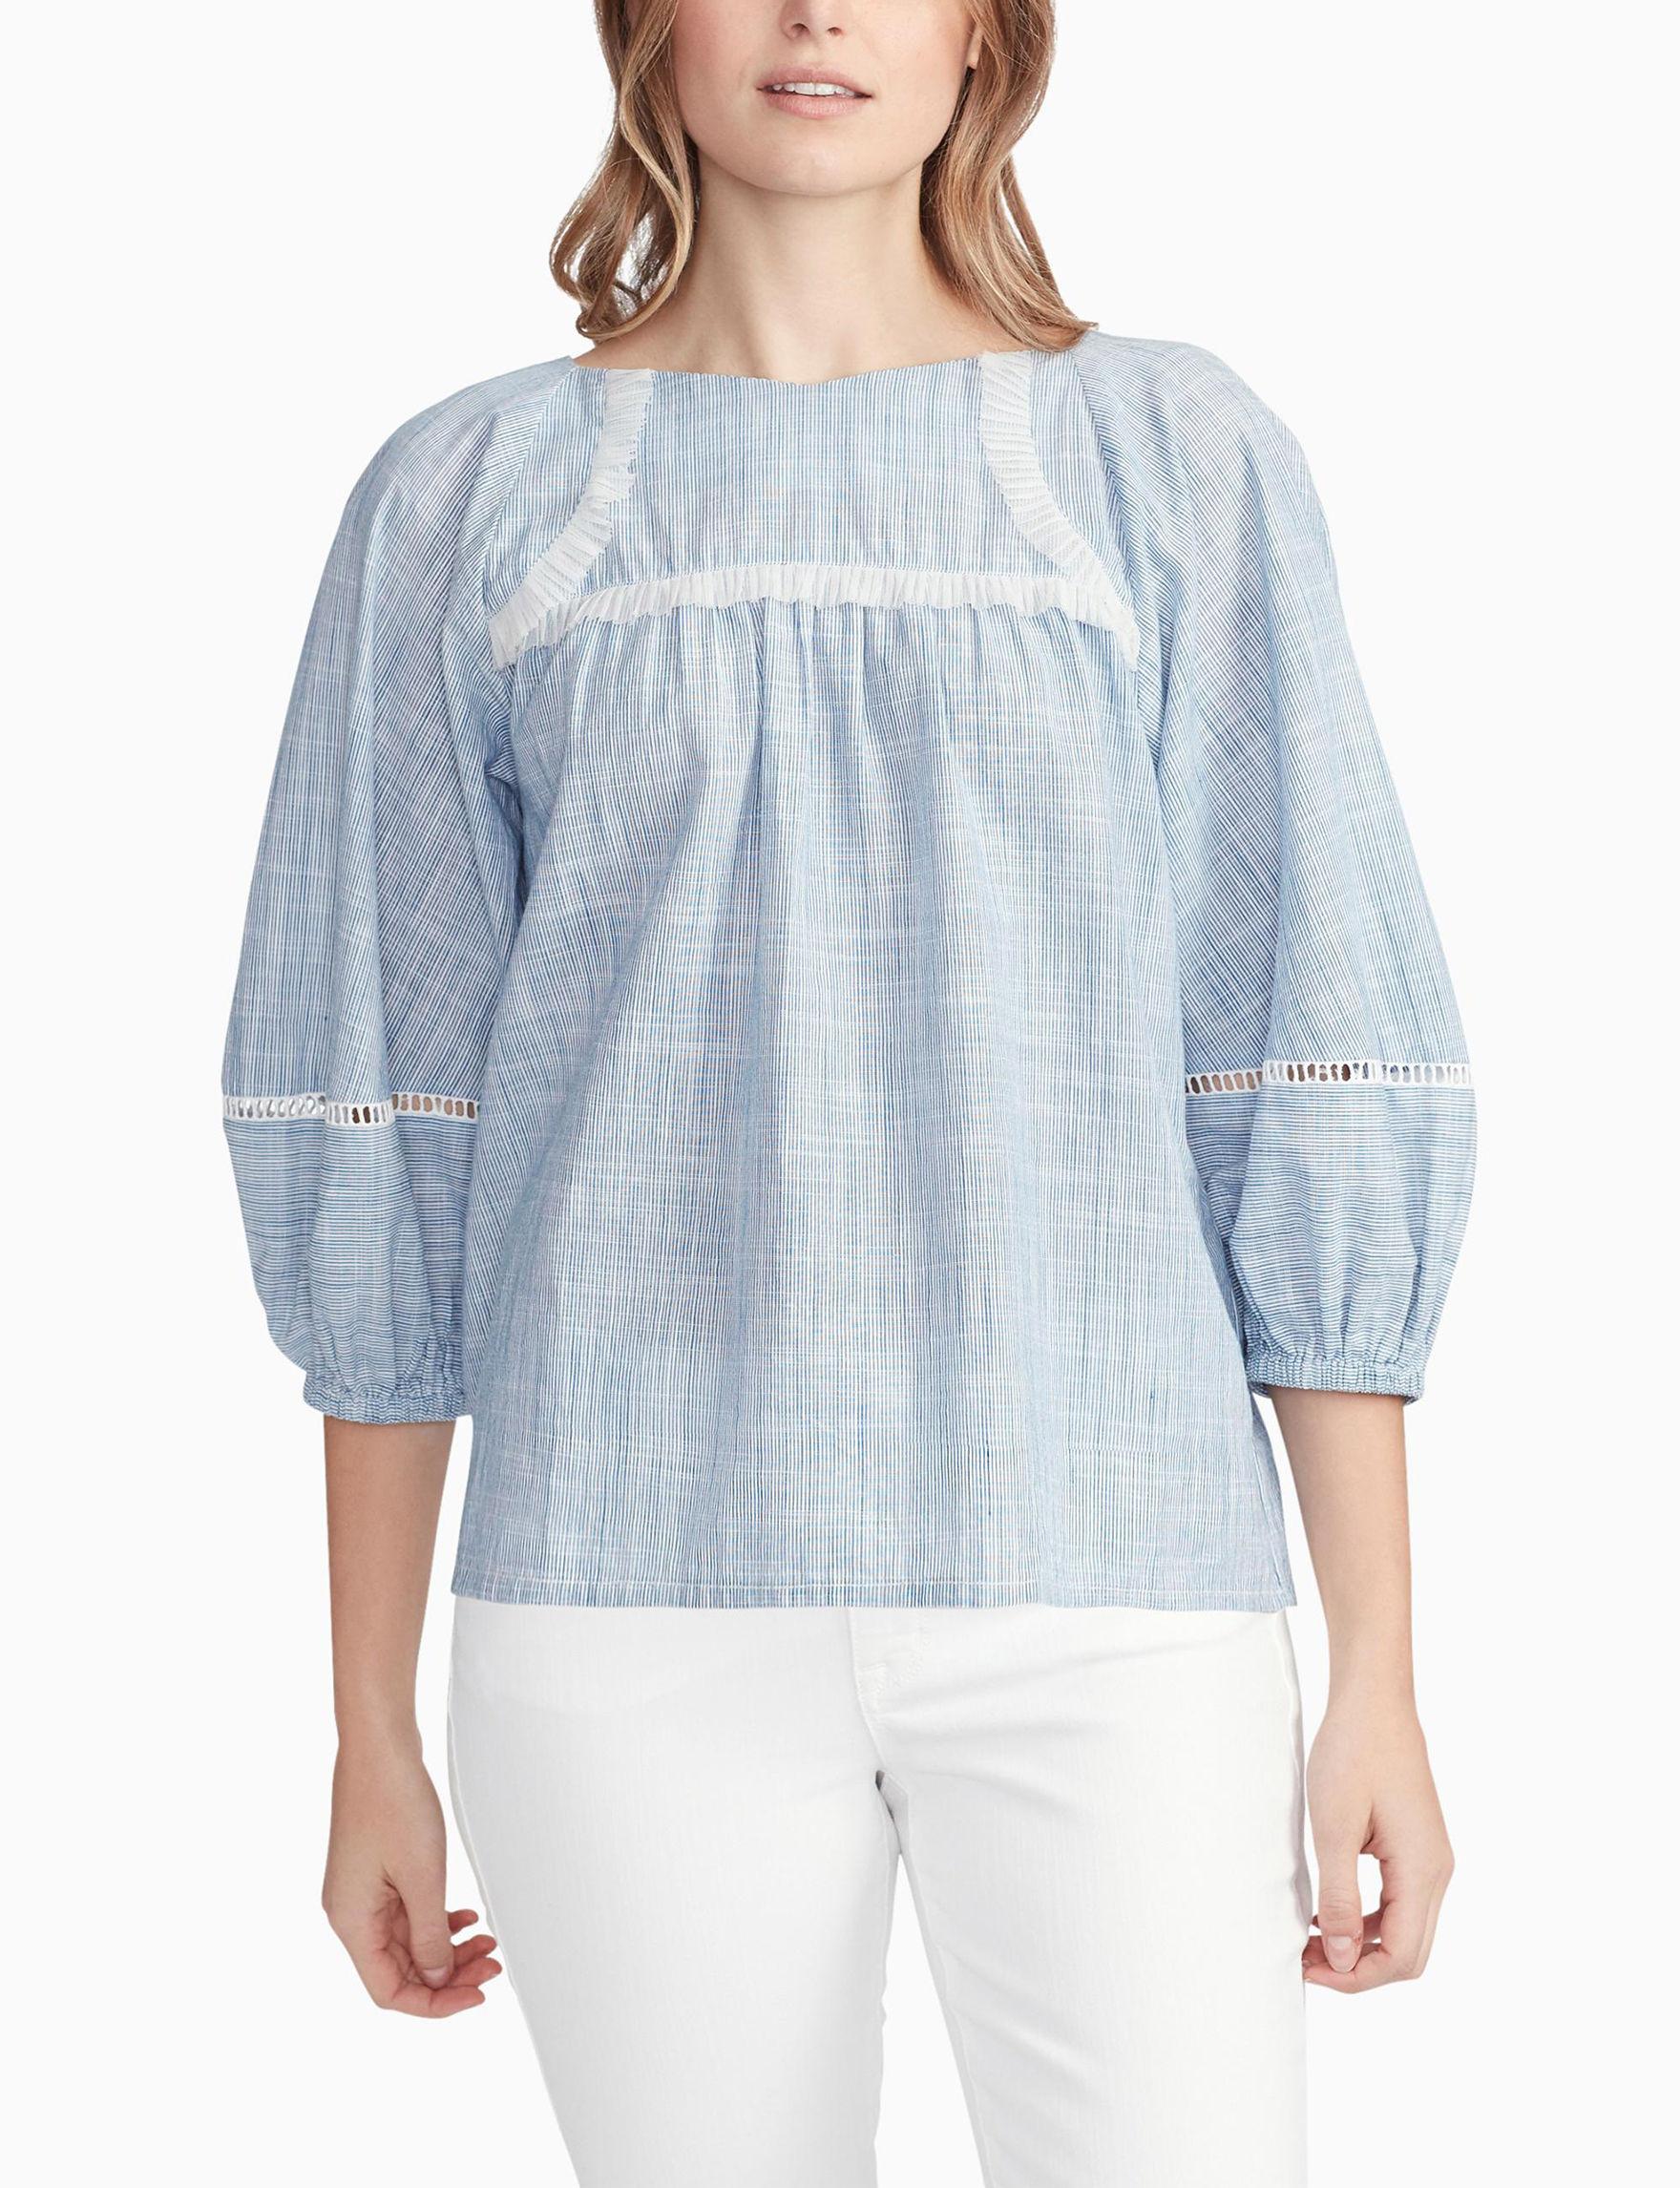 Vintage America Blues Blue / White Shirts & Blouses